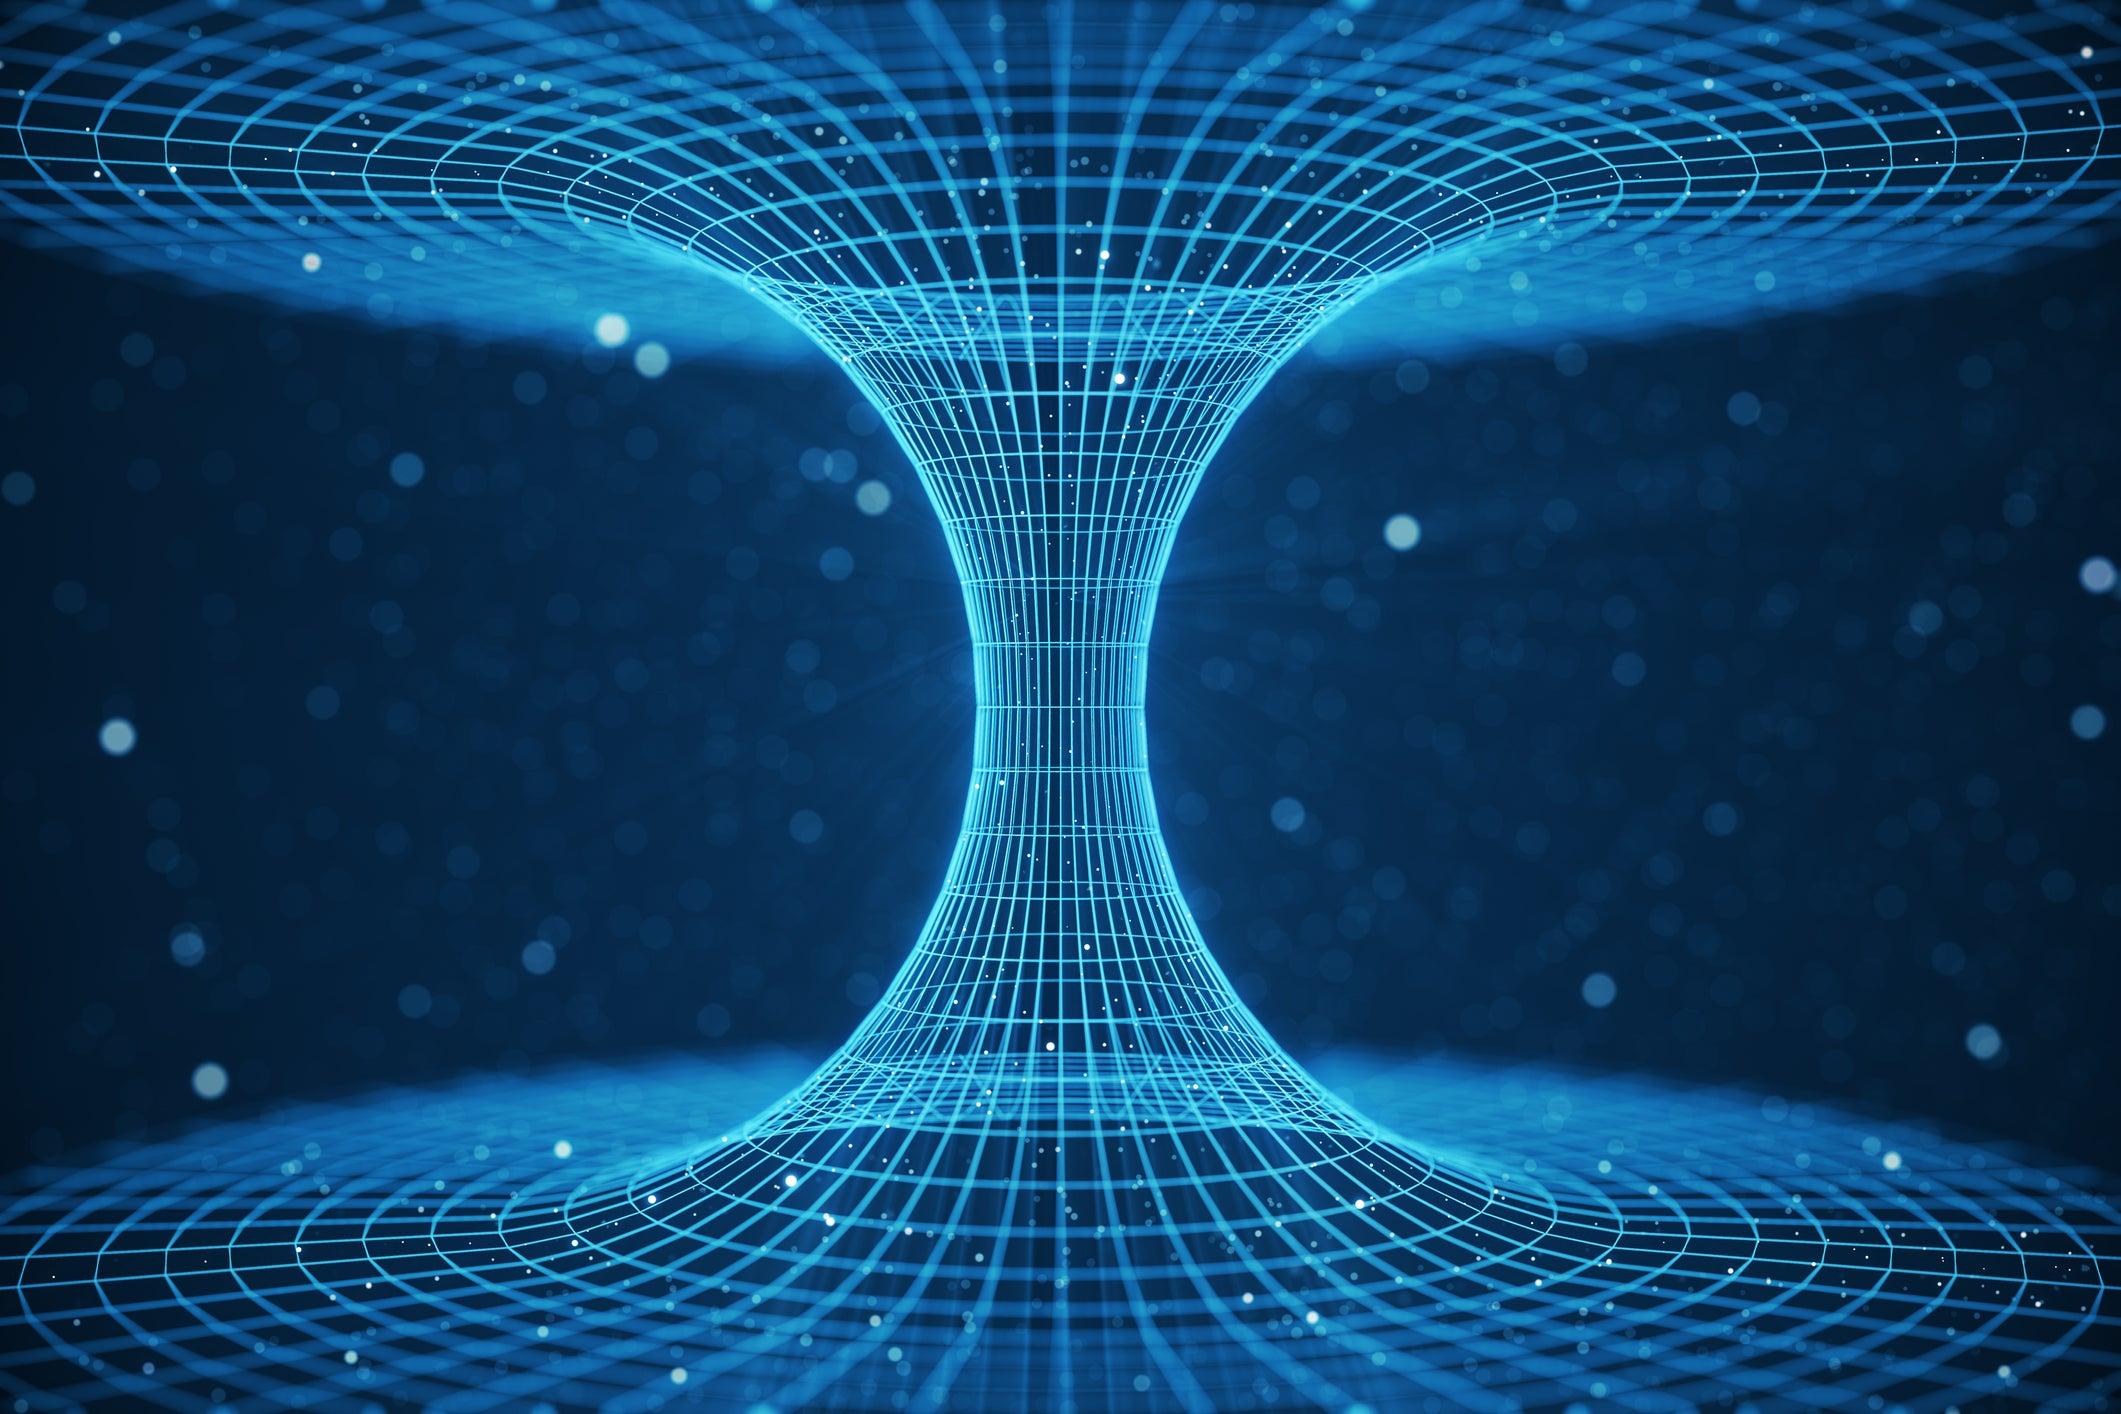 Are Wormholes Real? - Scientific American